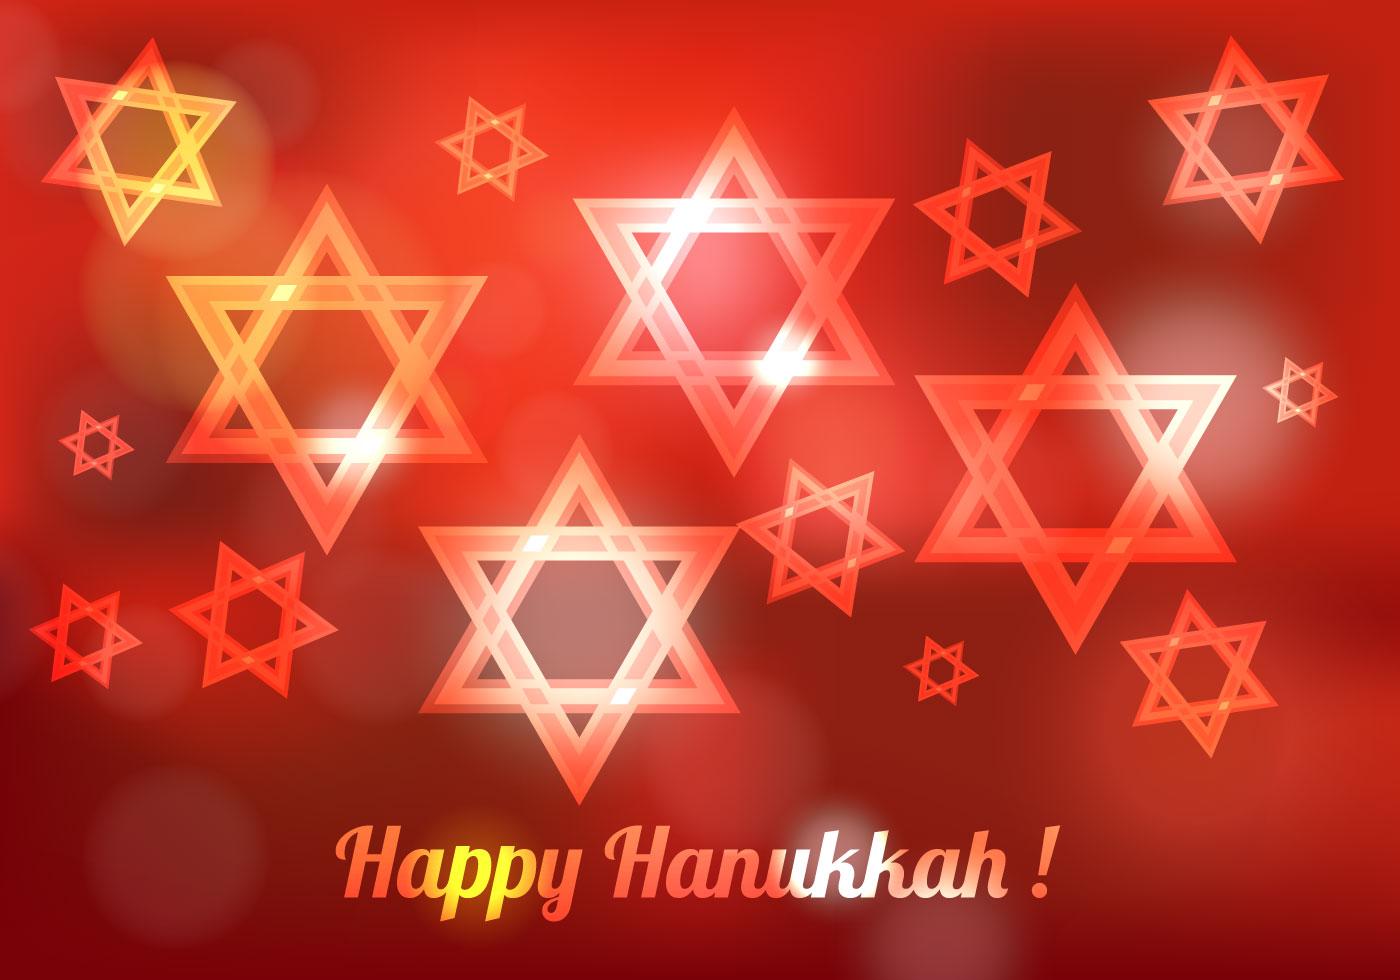 Free Hanukkah Blured Vector Download Free Vector Art Stock